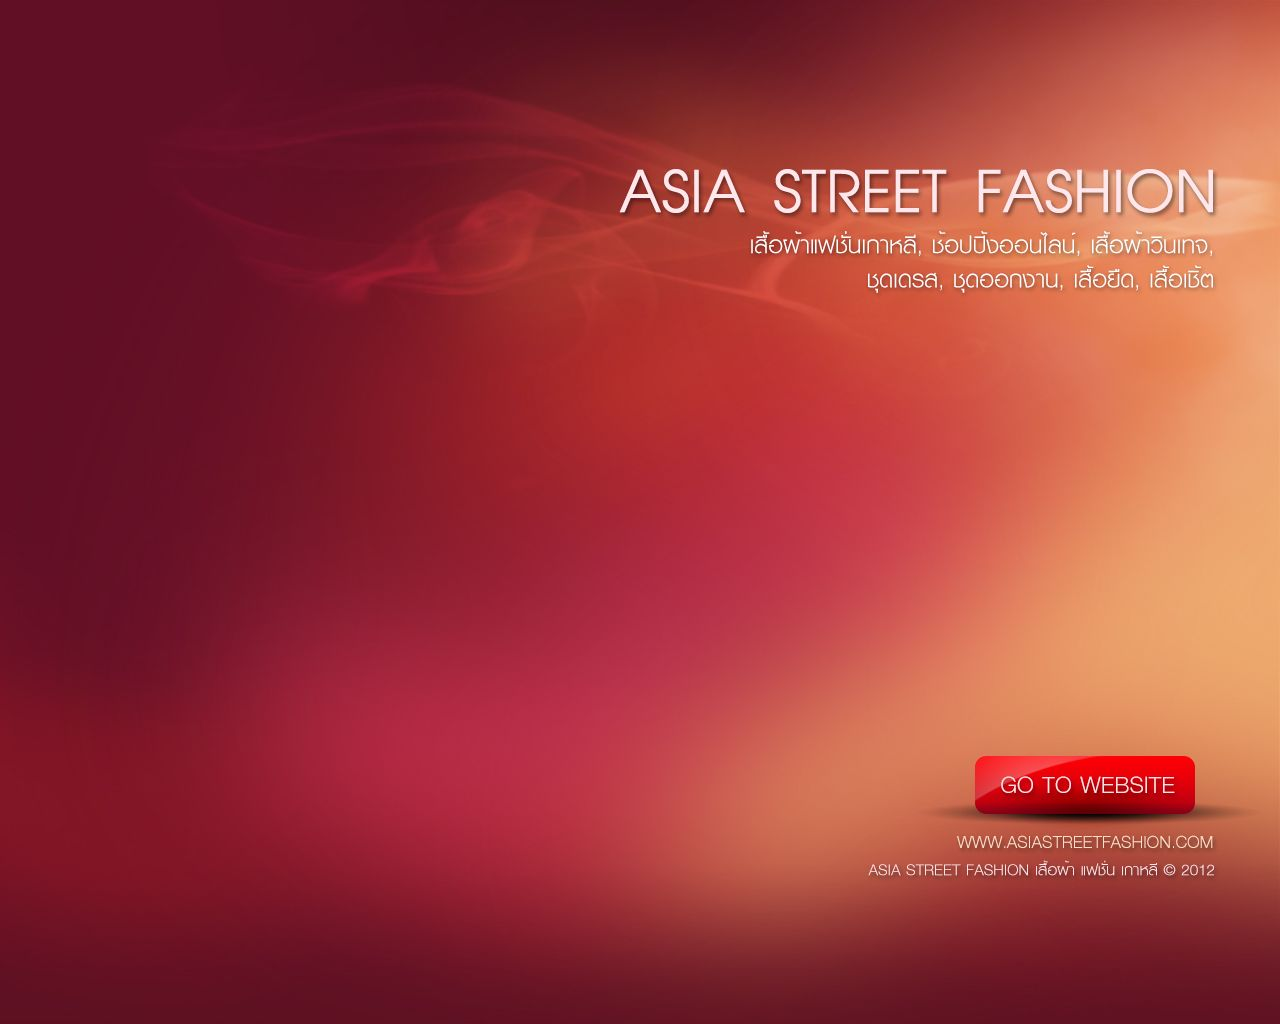 Free Desktop Background From Asia Street Fashion